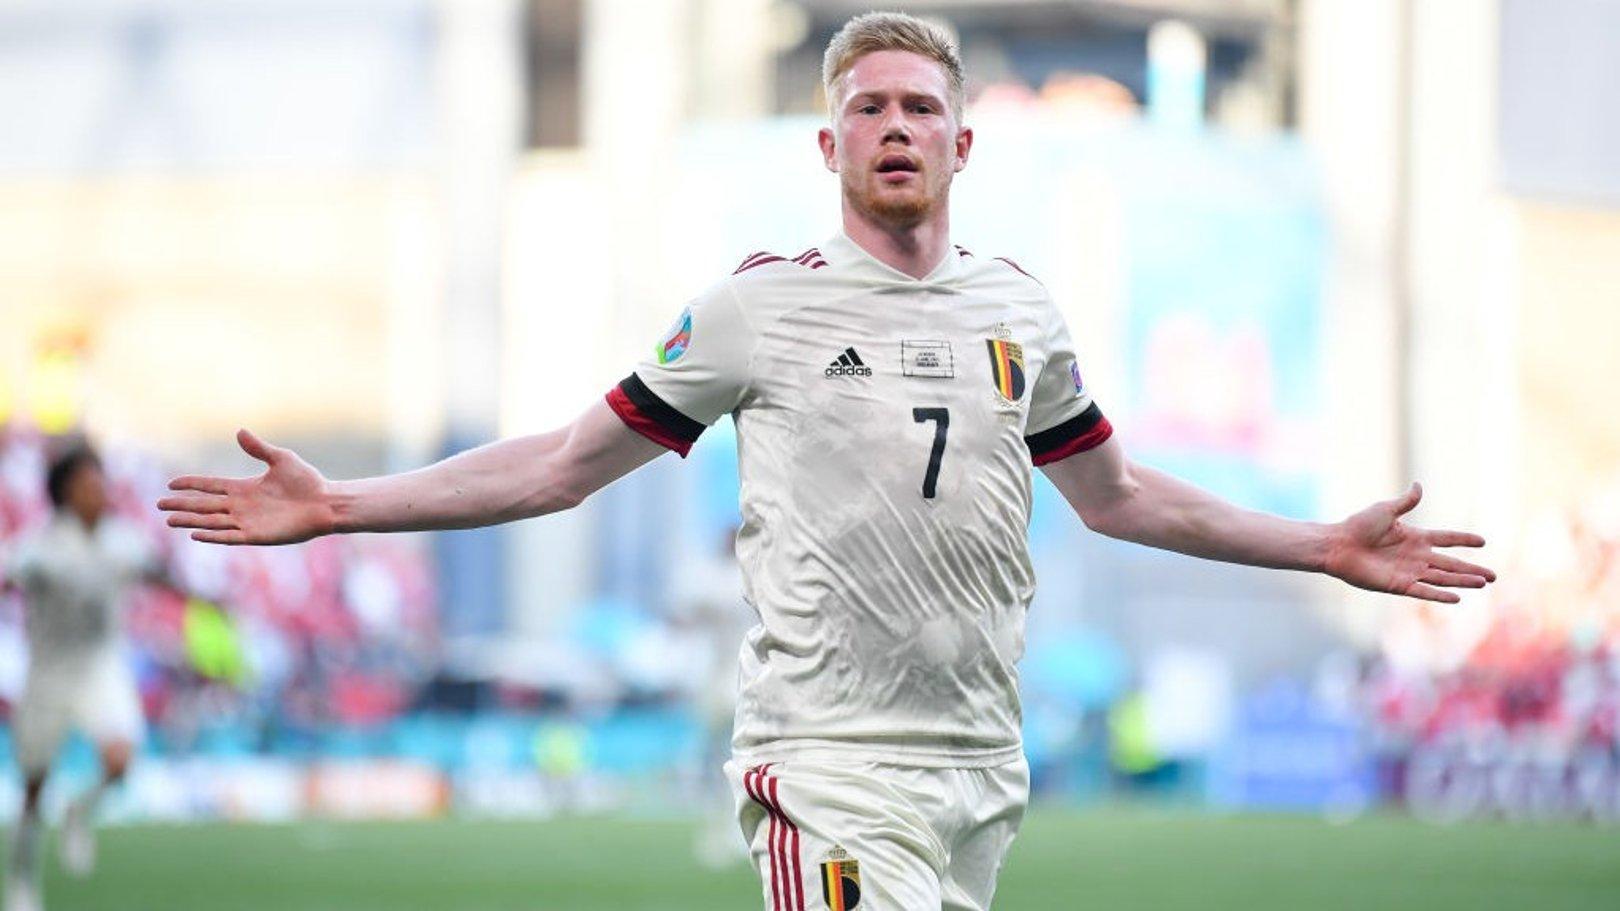 Brilliant De Bruyne returns in style to fire Belgium into last 16 at Euro 2020